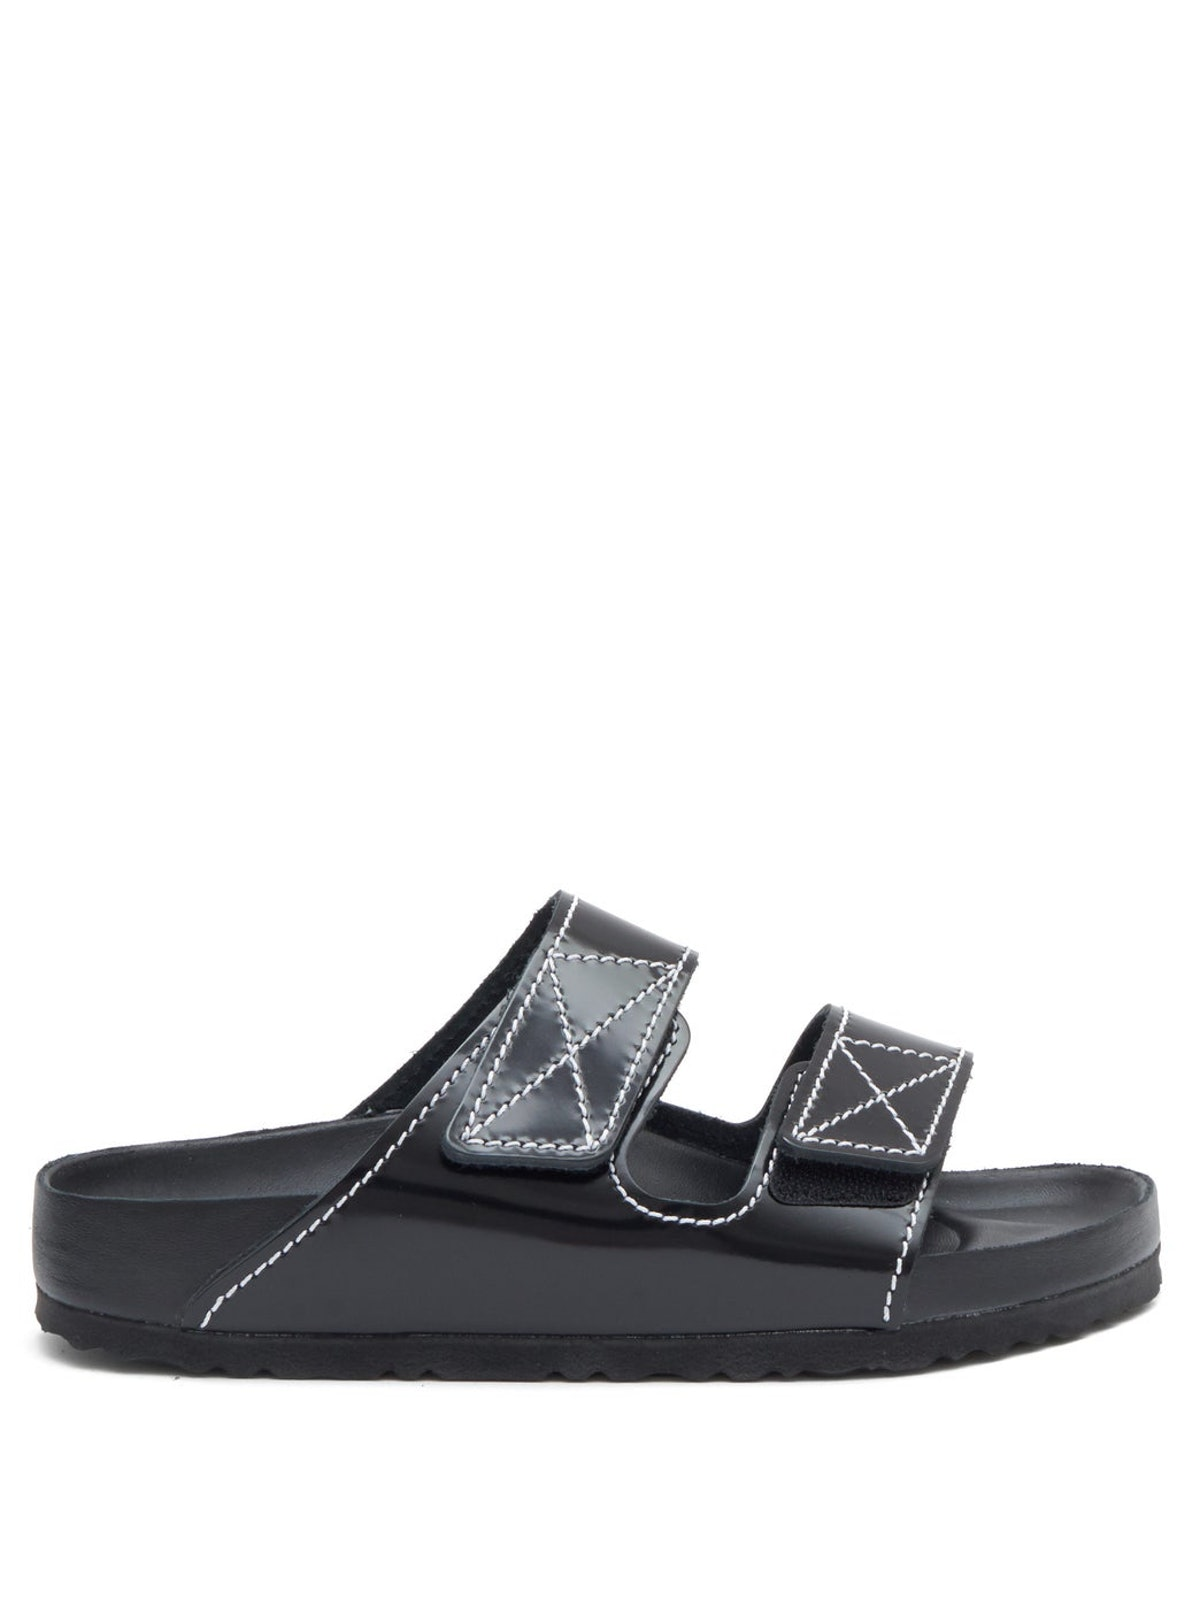 Arizona Leather Slides